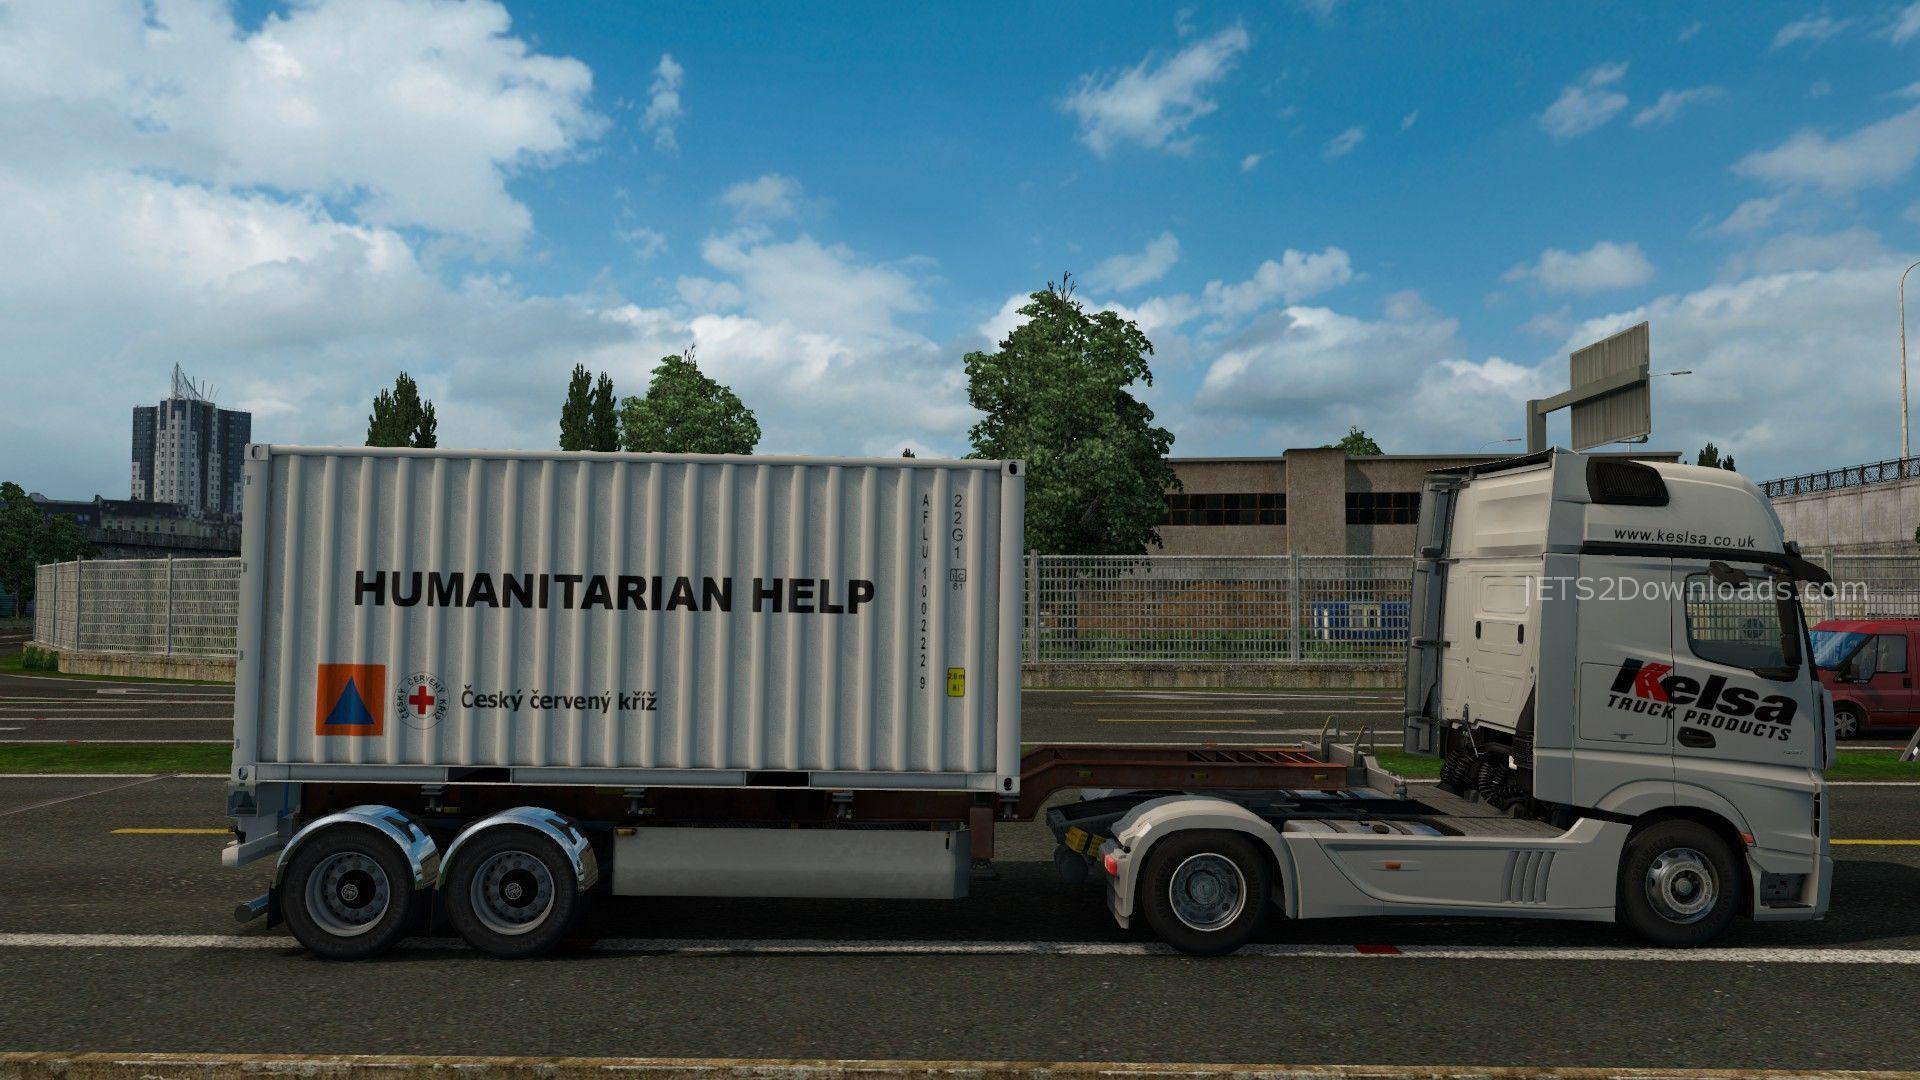 humanitarian-help-trailer-1